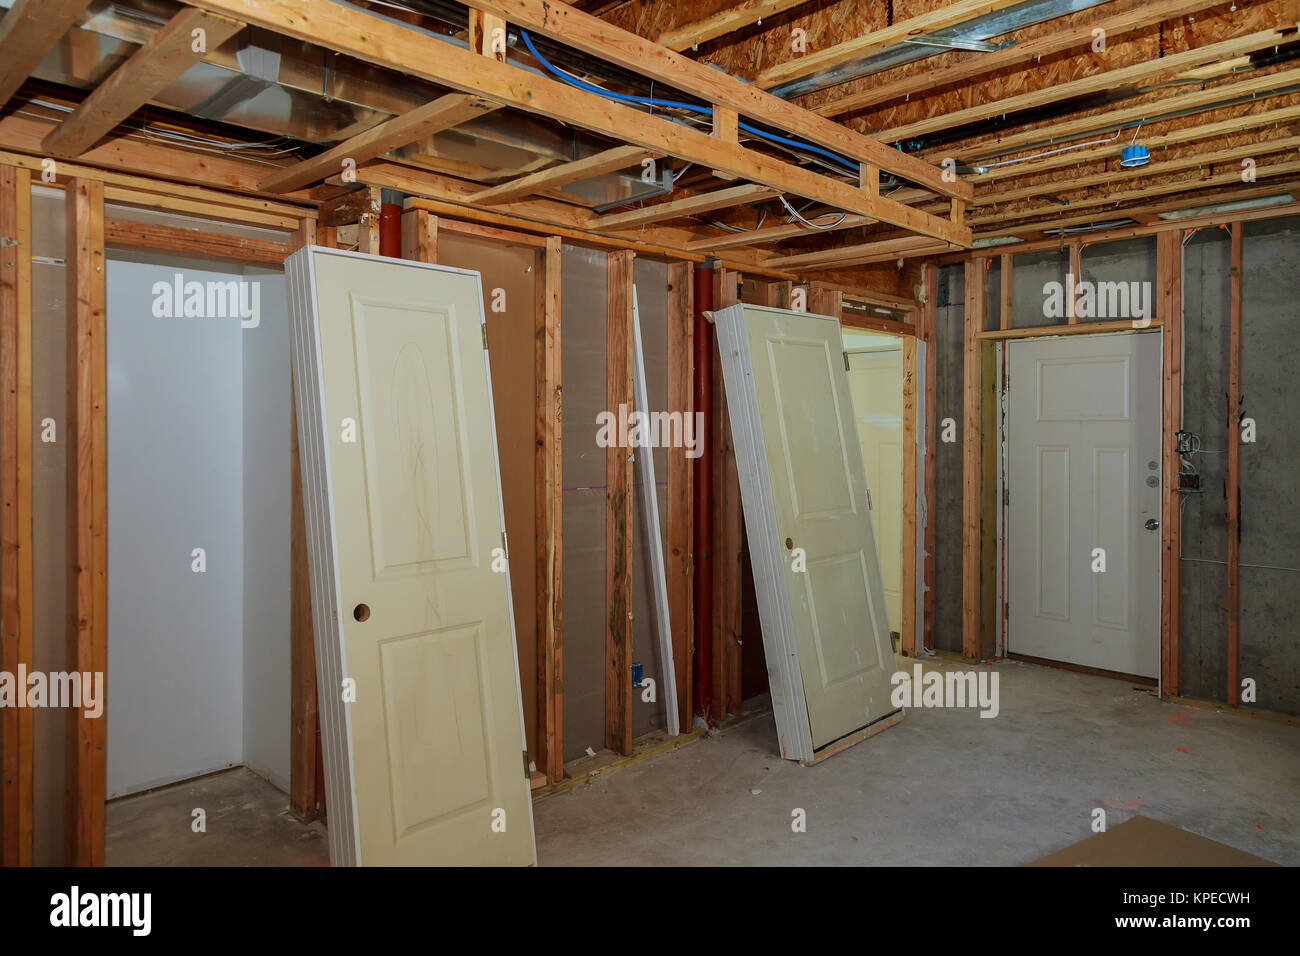 Apartment Installation Stockfotos & Apartment Installation Bilder ...